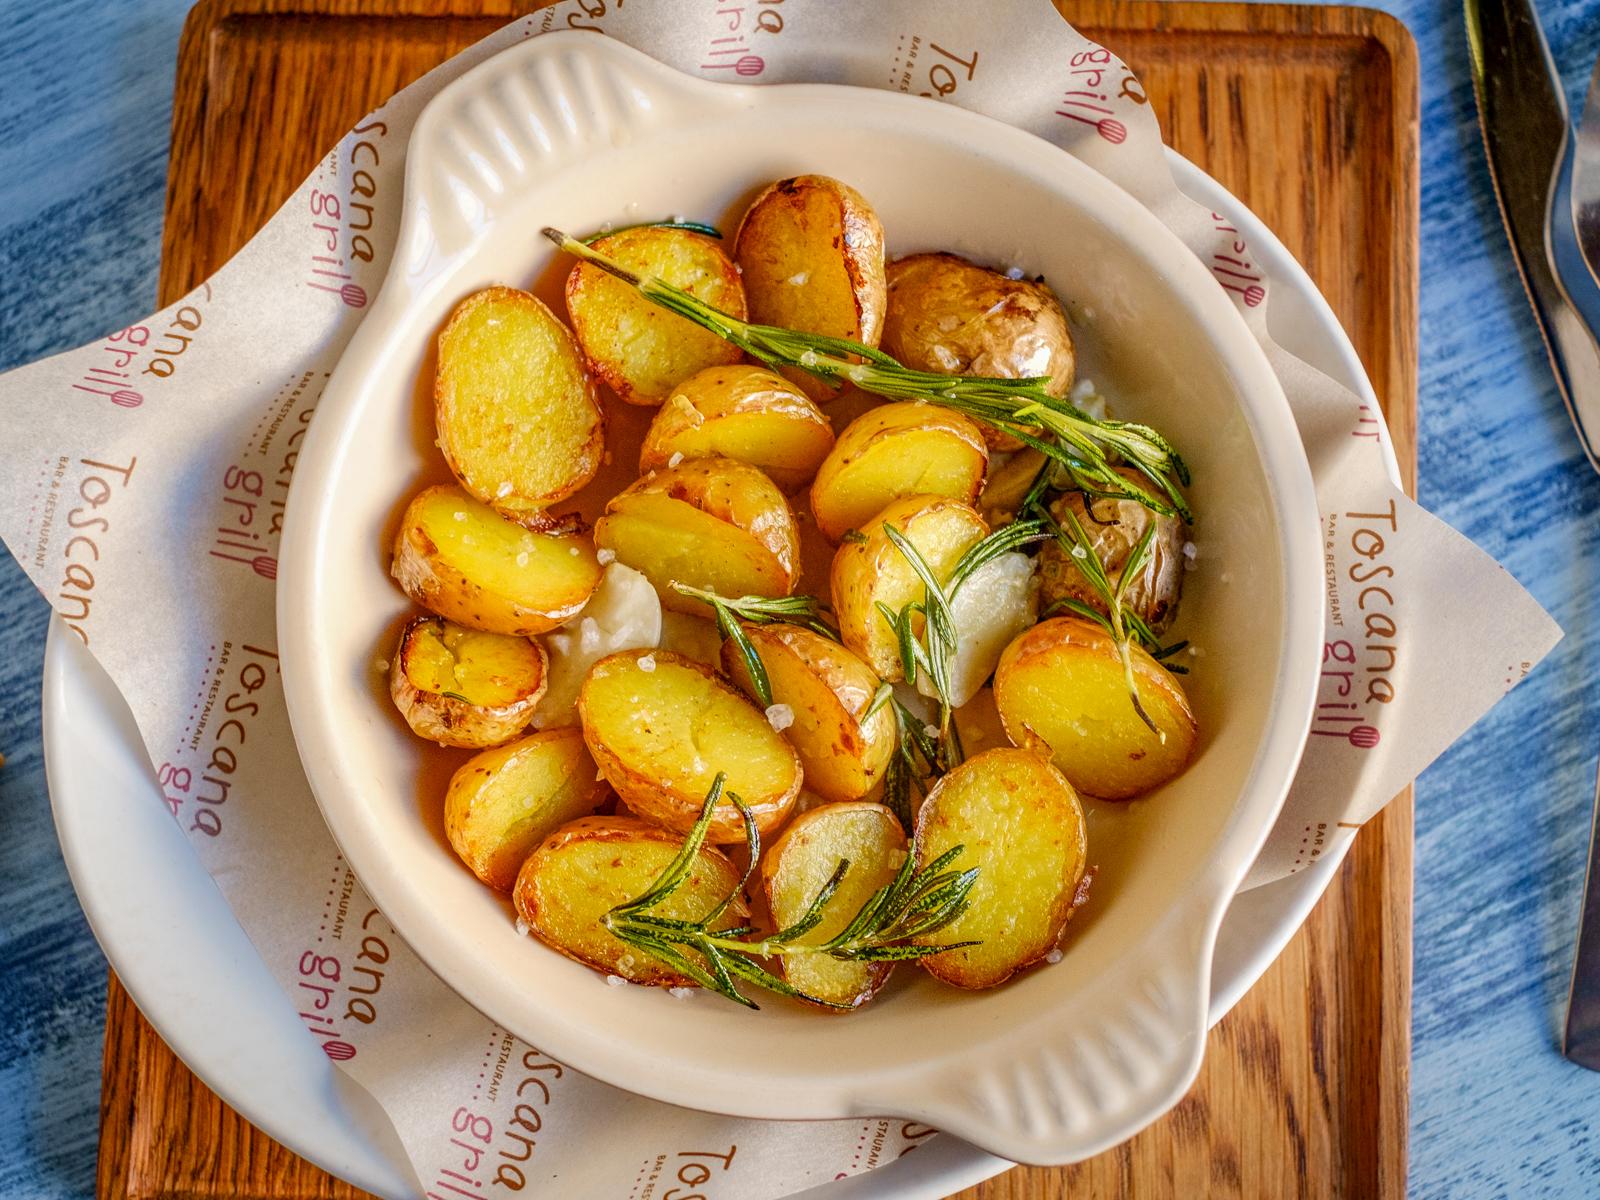 Картофель стоун с чесноком и розмарином